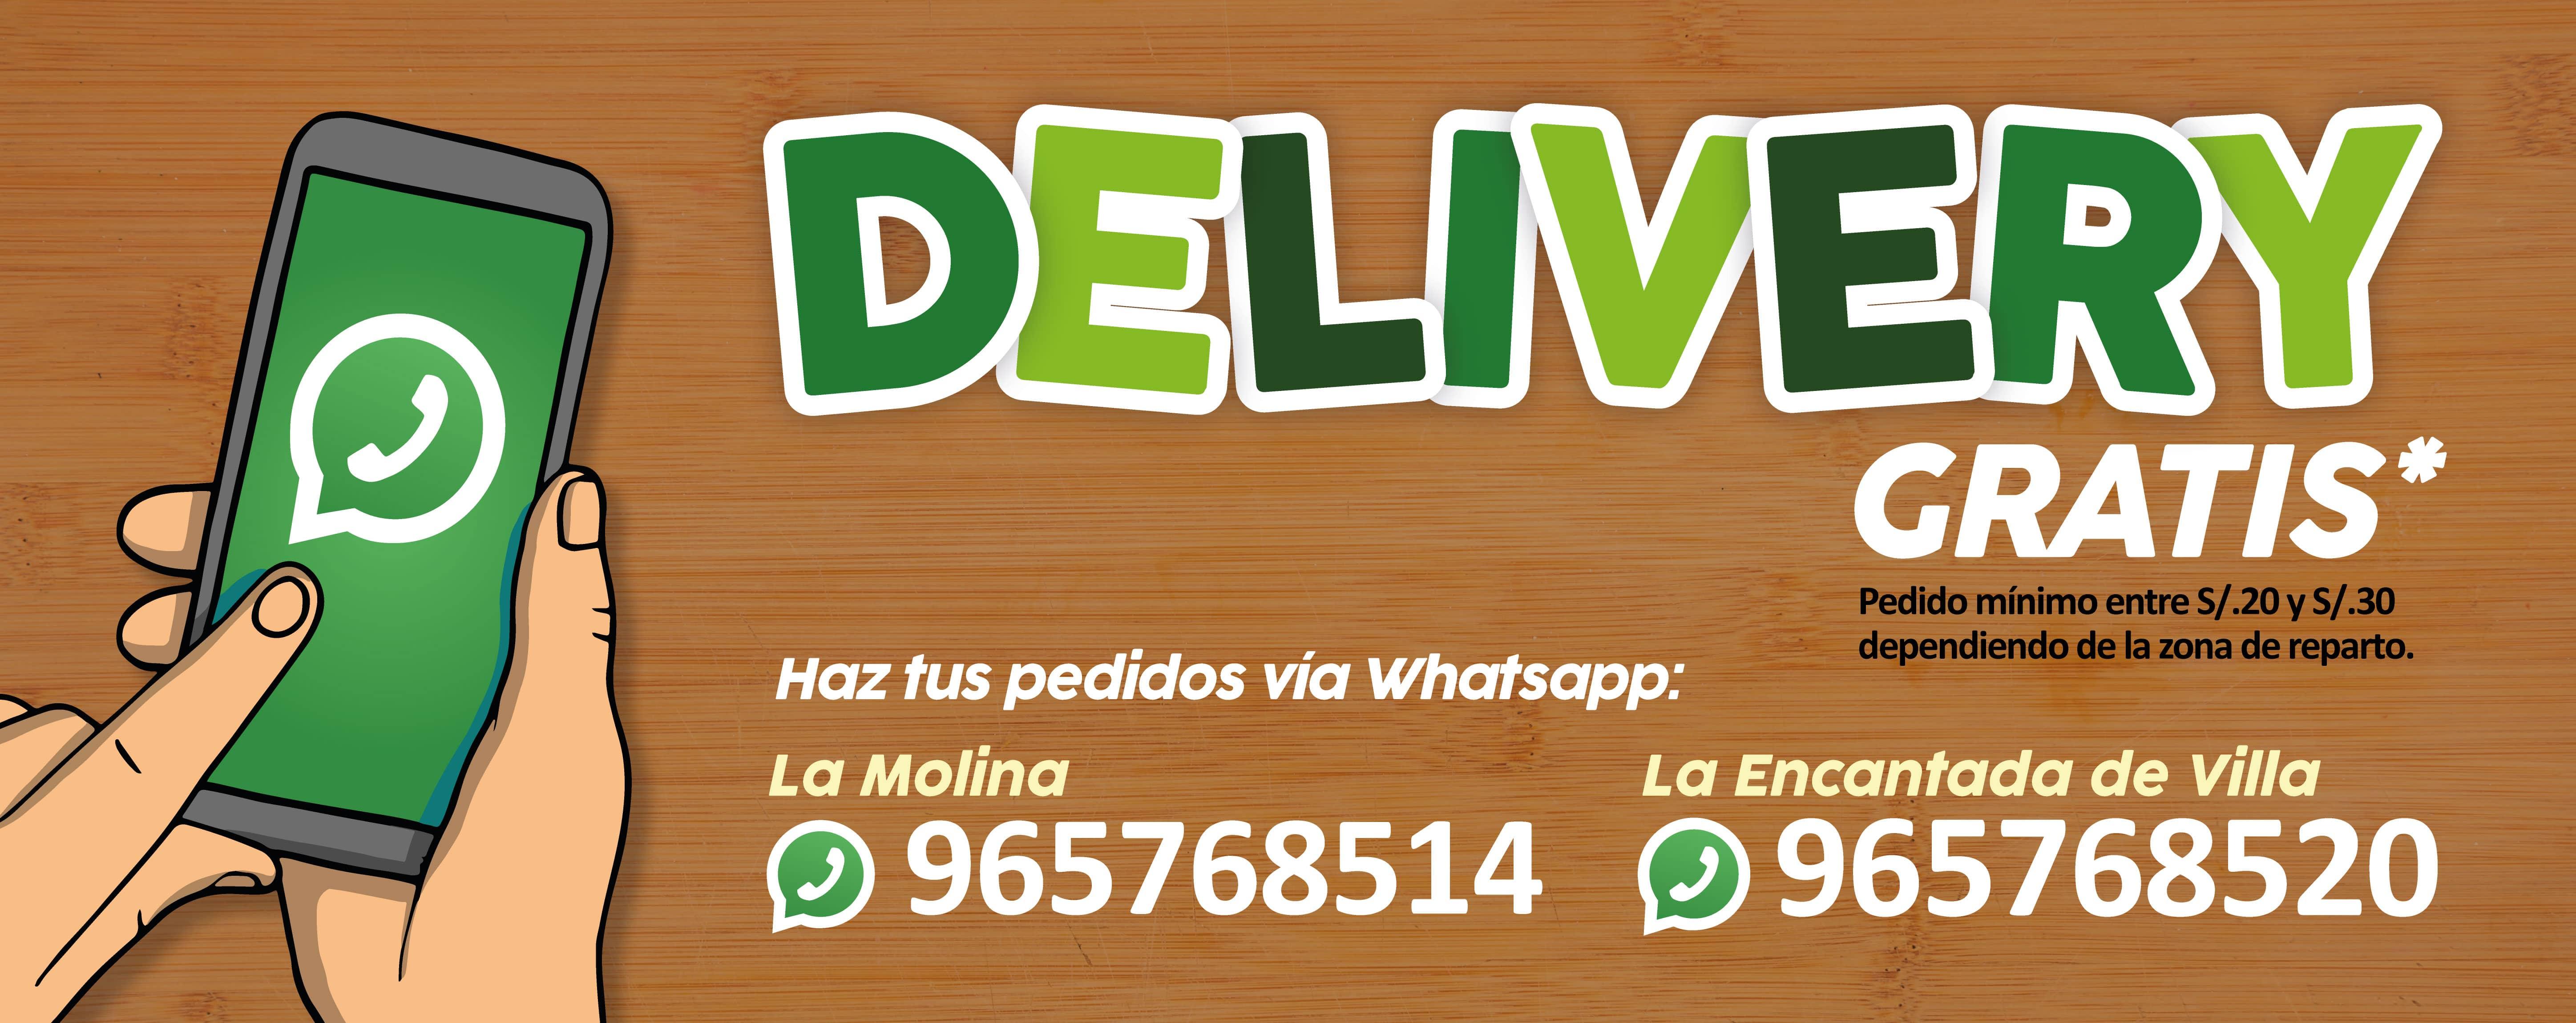 Portada-Delivery-1158x460-banner-min